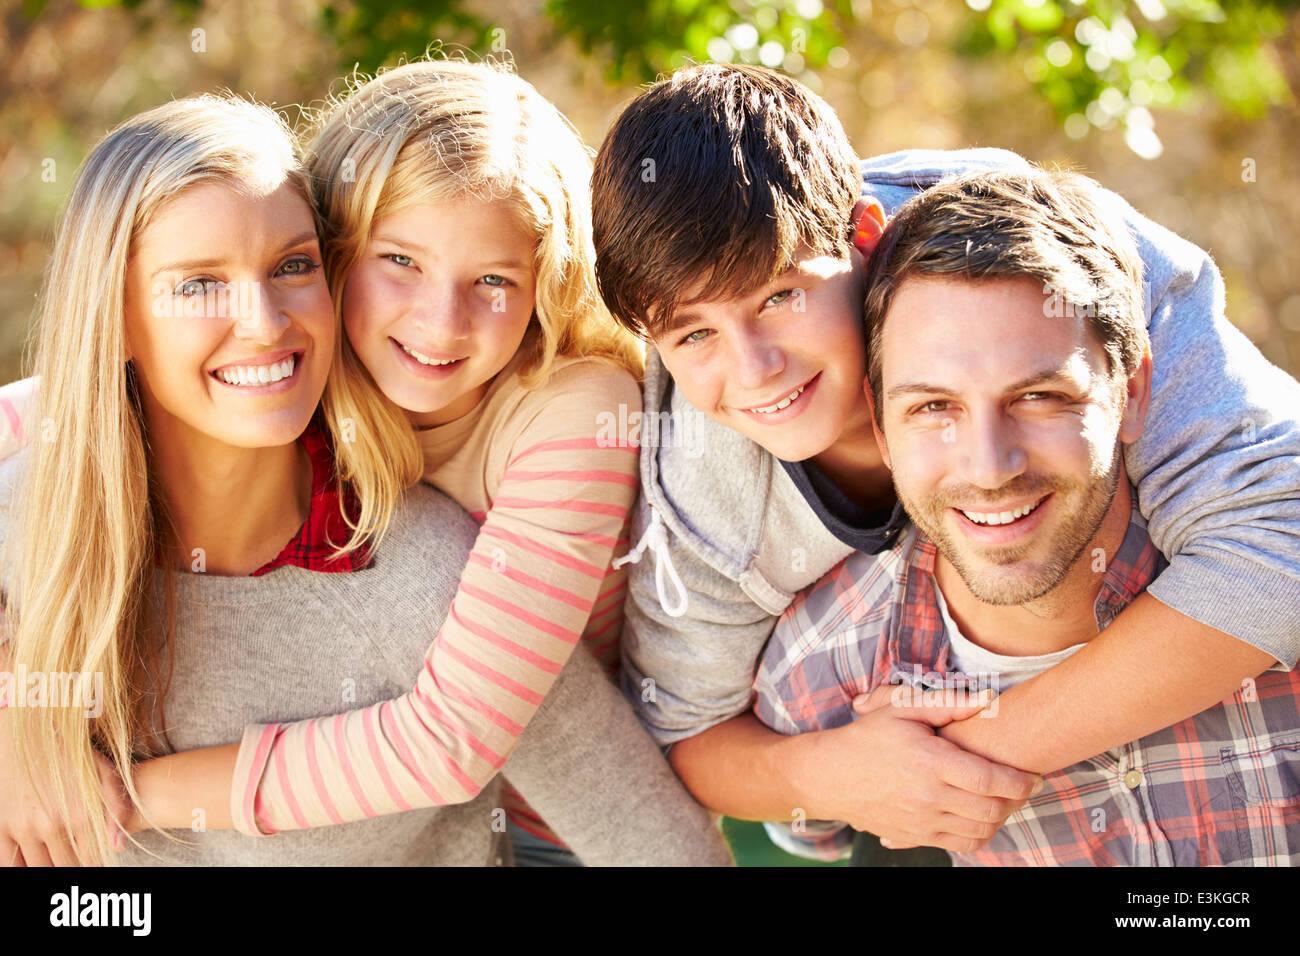 Portrait of Hispanic Family in Countryside Photo Stock